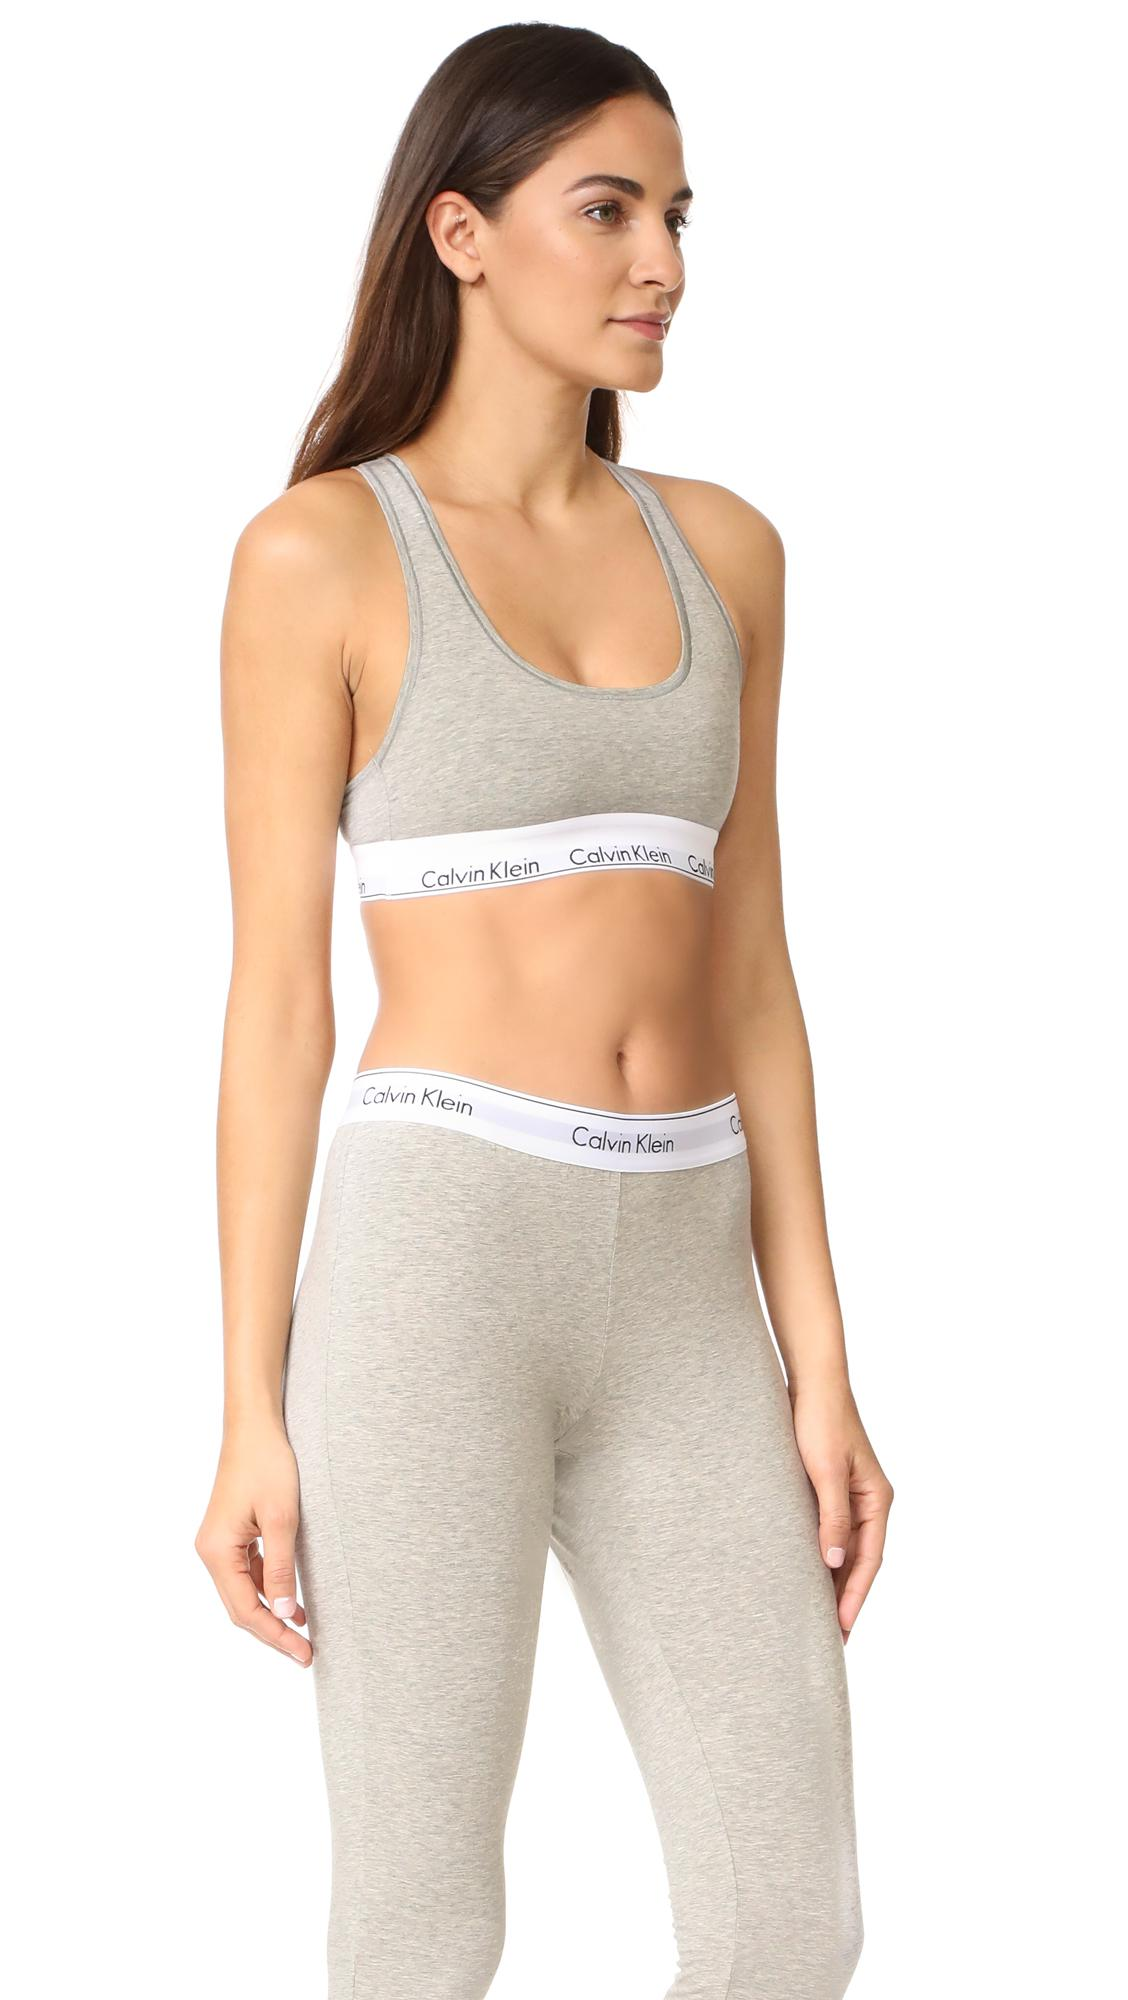 Calvin klein modern cotton bralette leggings set in gray - Wandspiegel groay modern ...